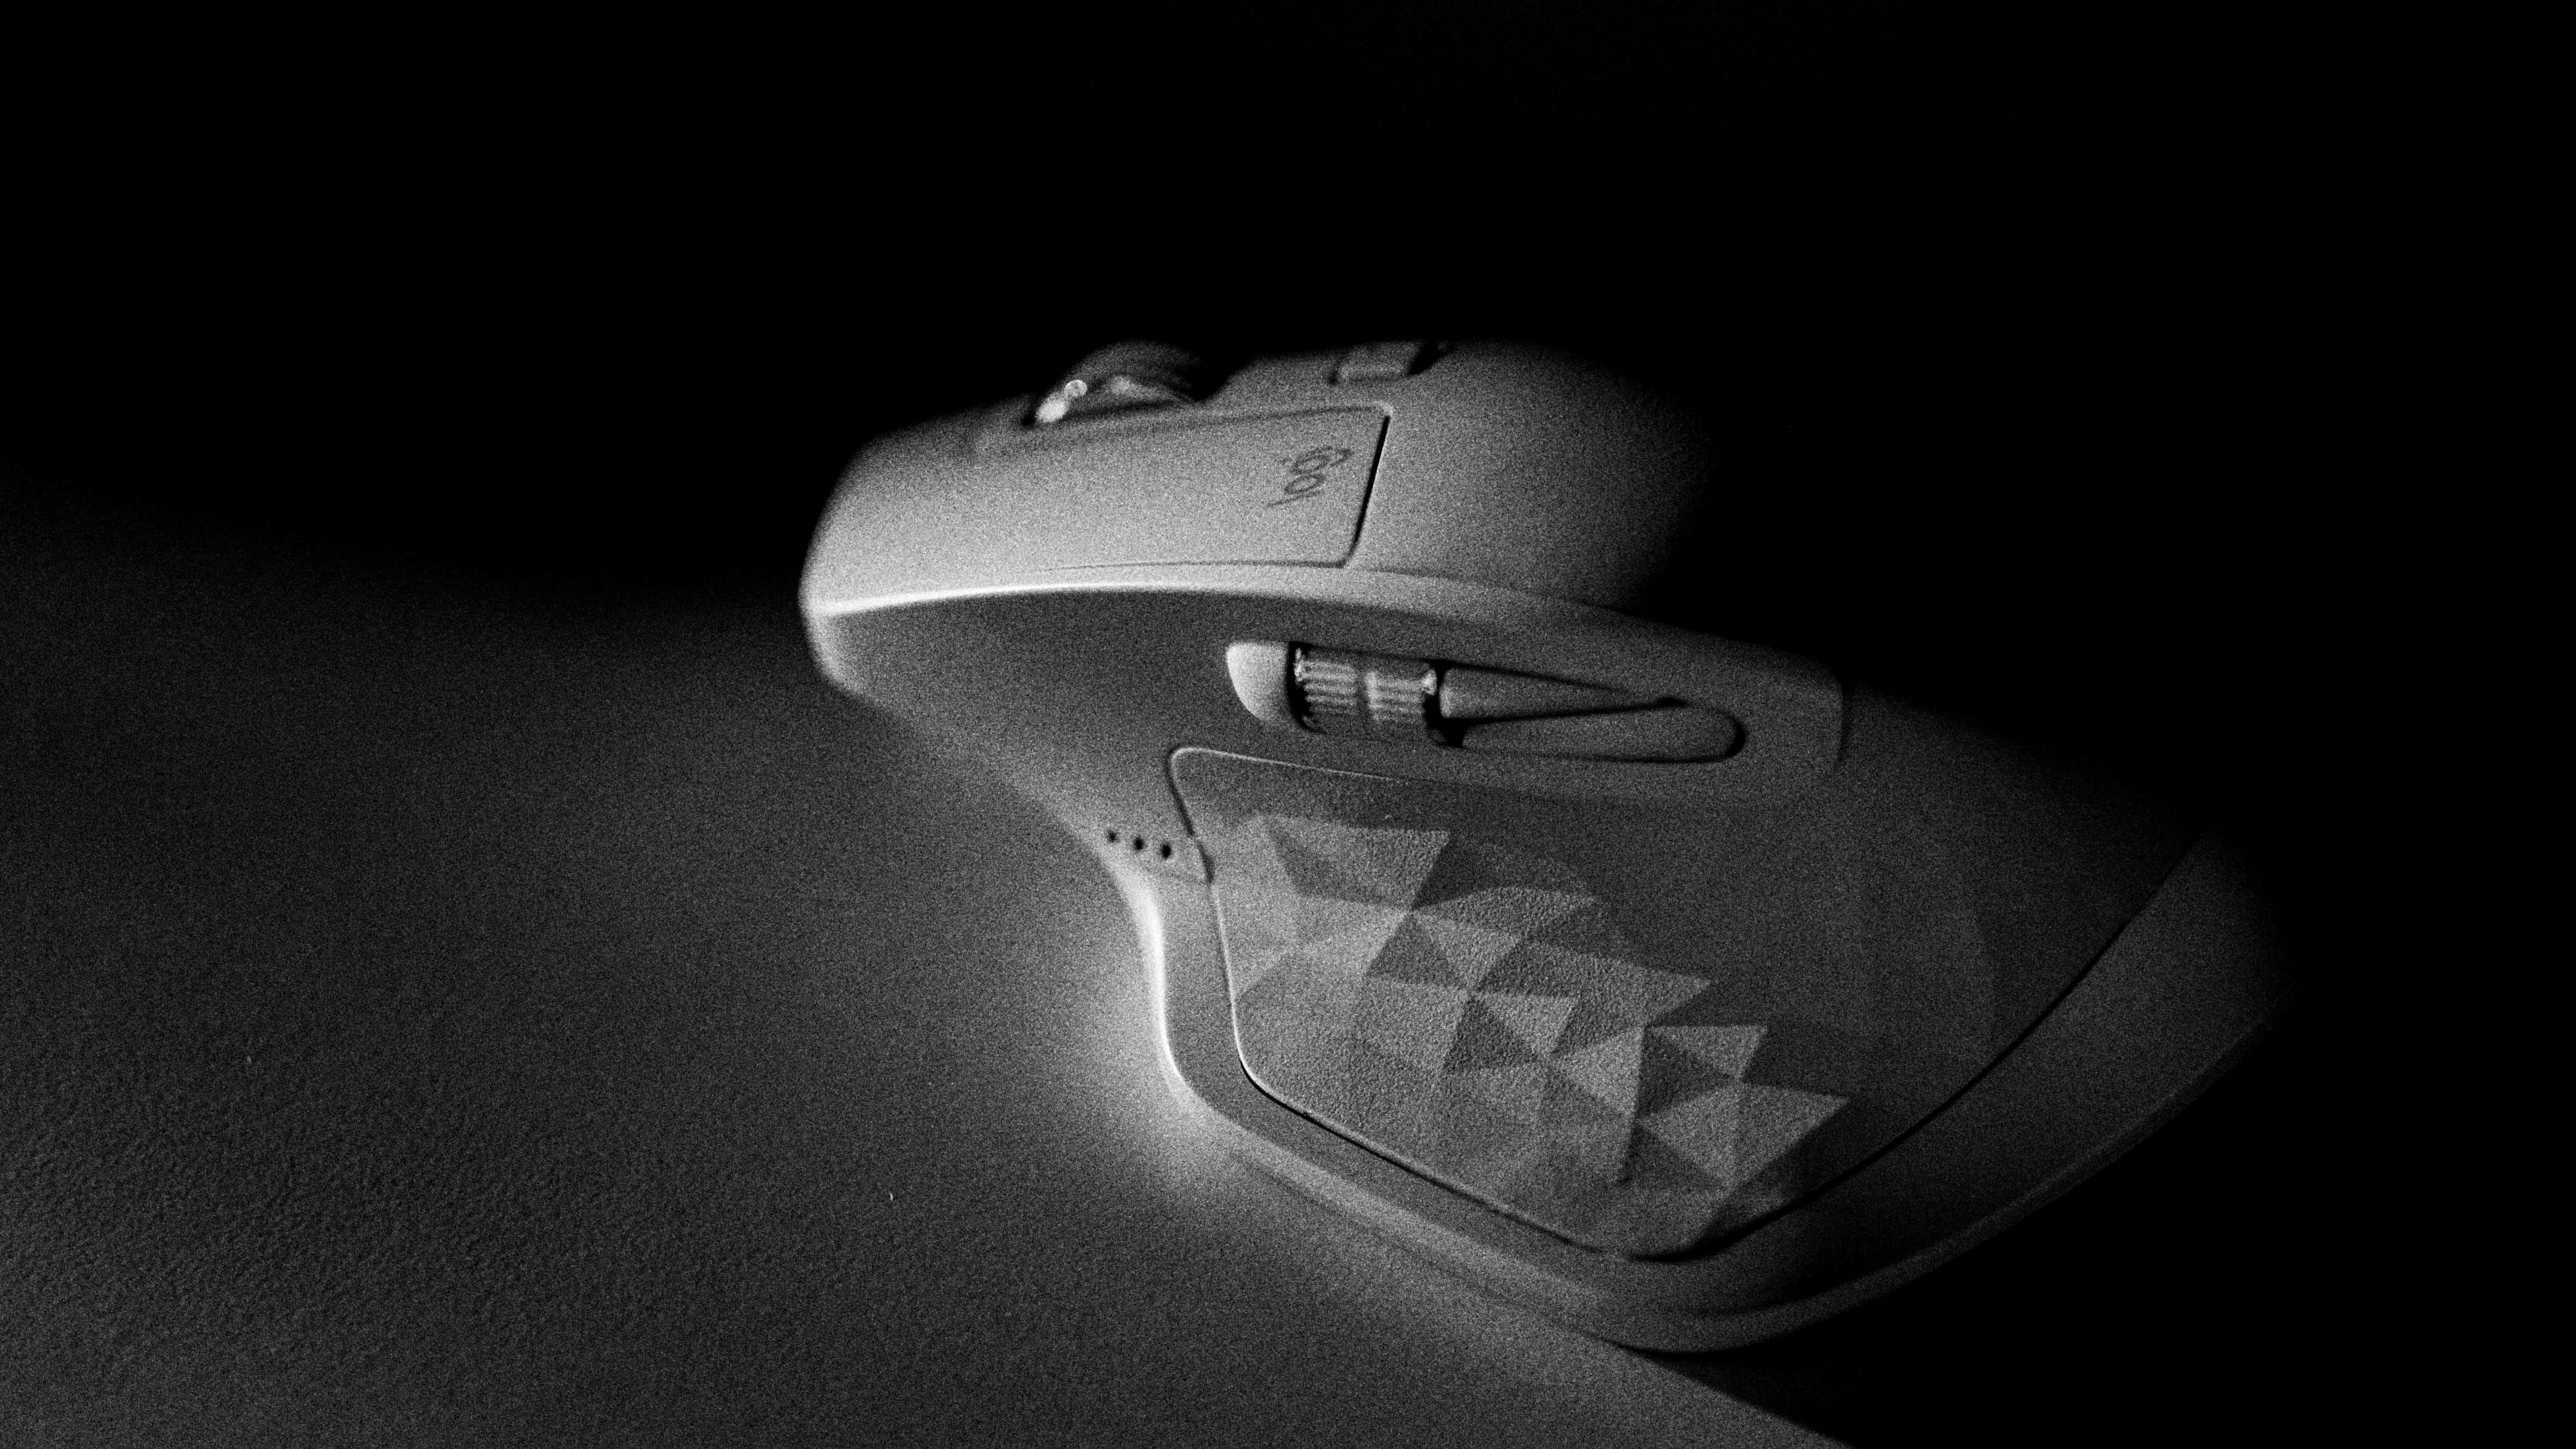 Mouse Computer Hardware Desk Logi Logitech Mx Master 2s Black And White Bnw Product Closeup Detail 4k Wal Logitech Logitech Mouse Logitech Keyboard